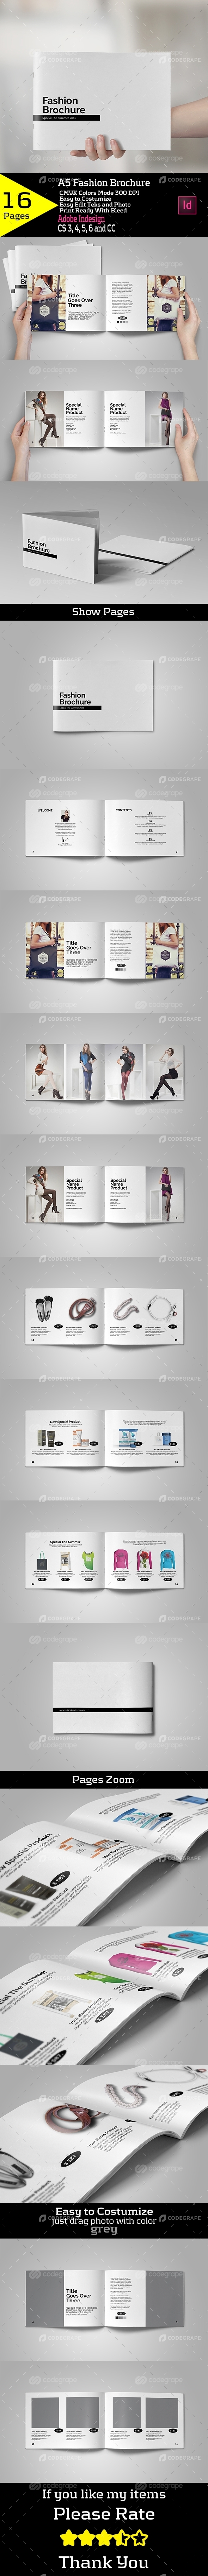 A5 Fashion Brochure